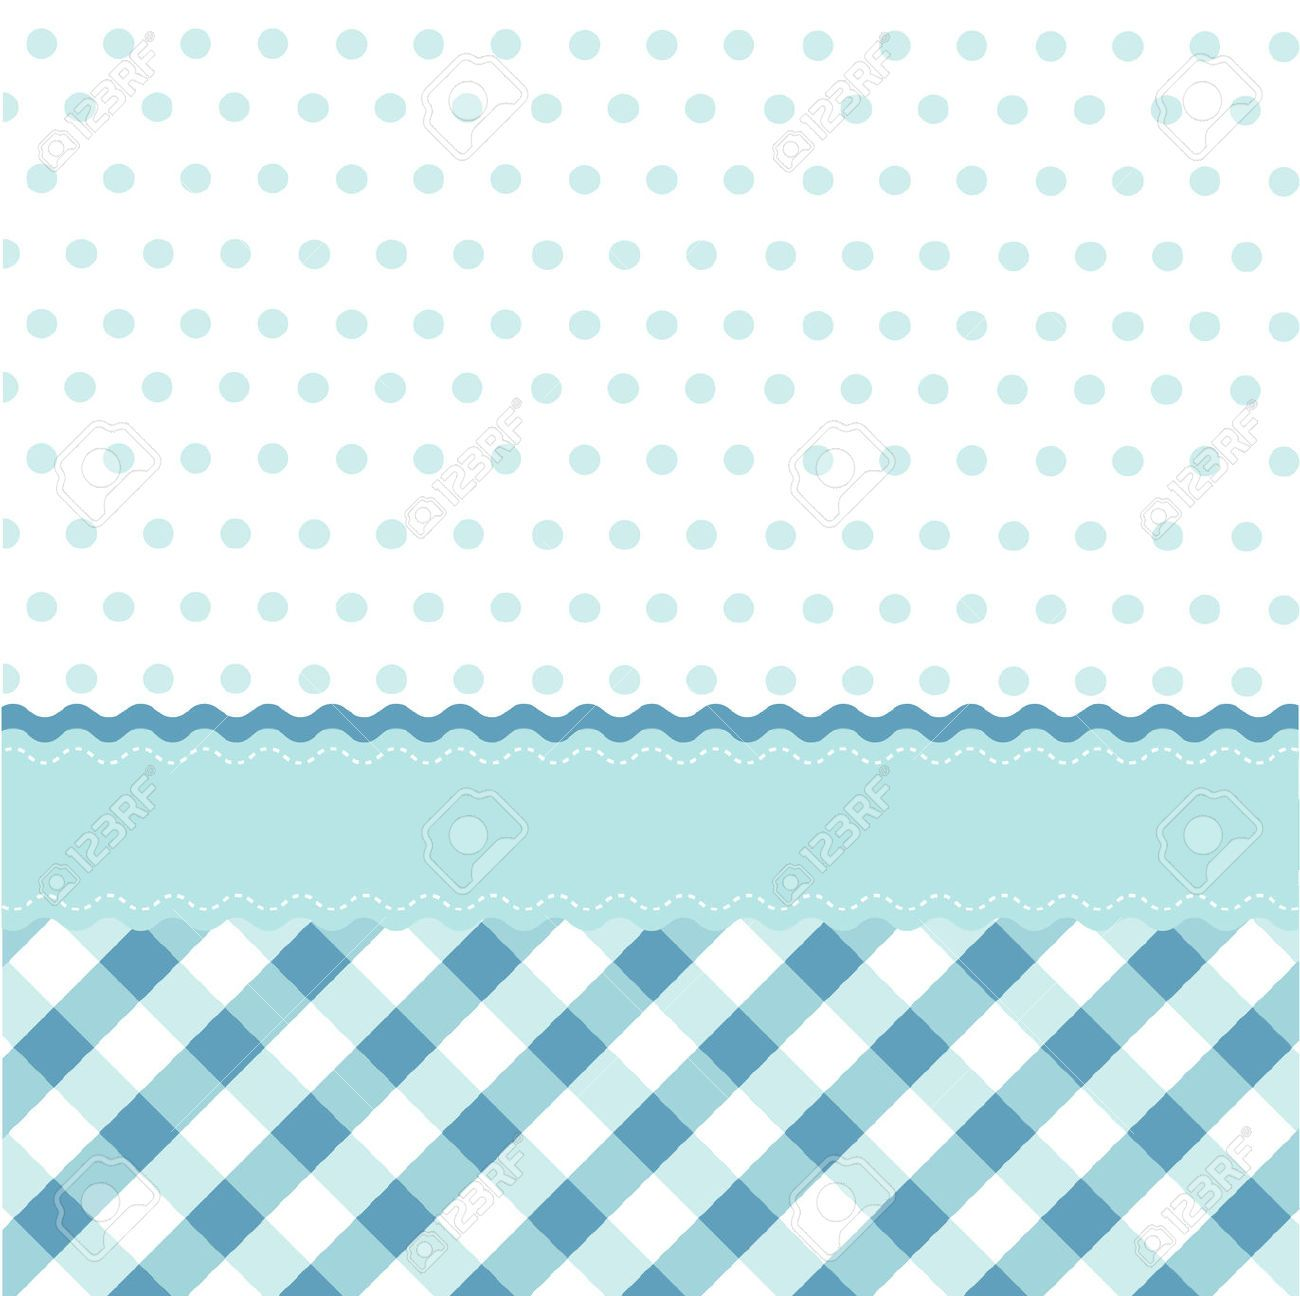 Stock Vector Blue background patterns, Blue pattern